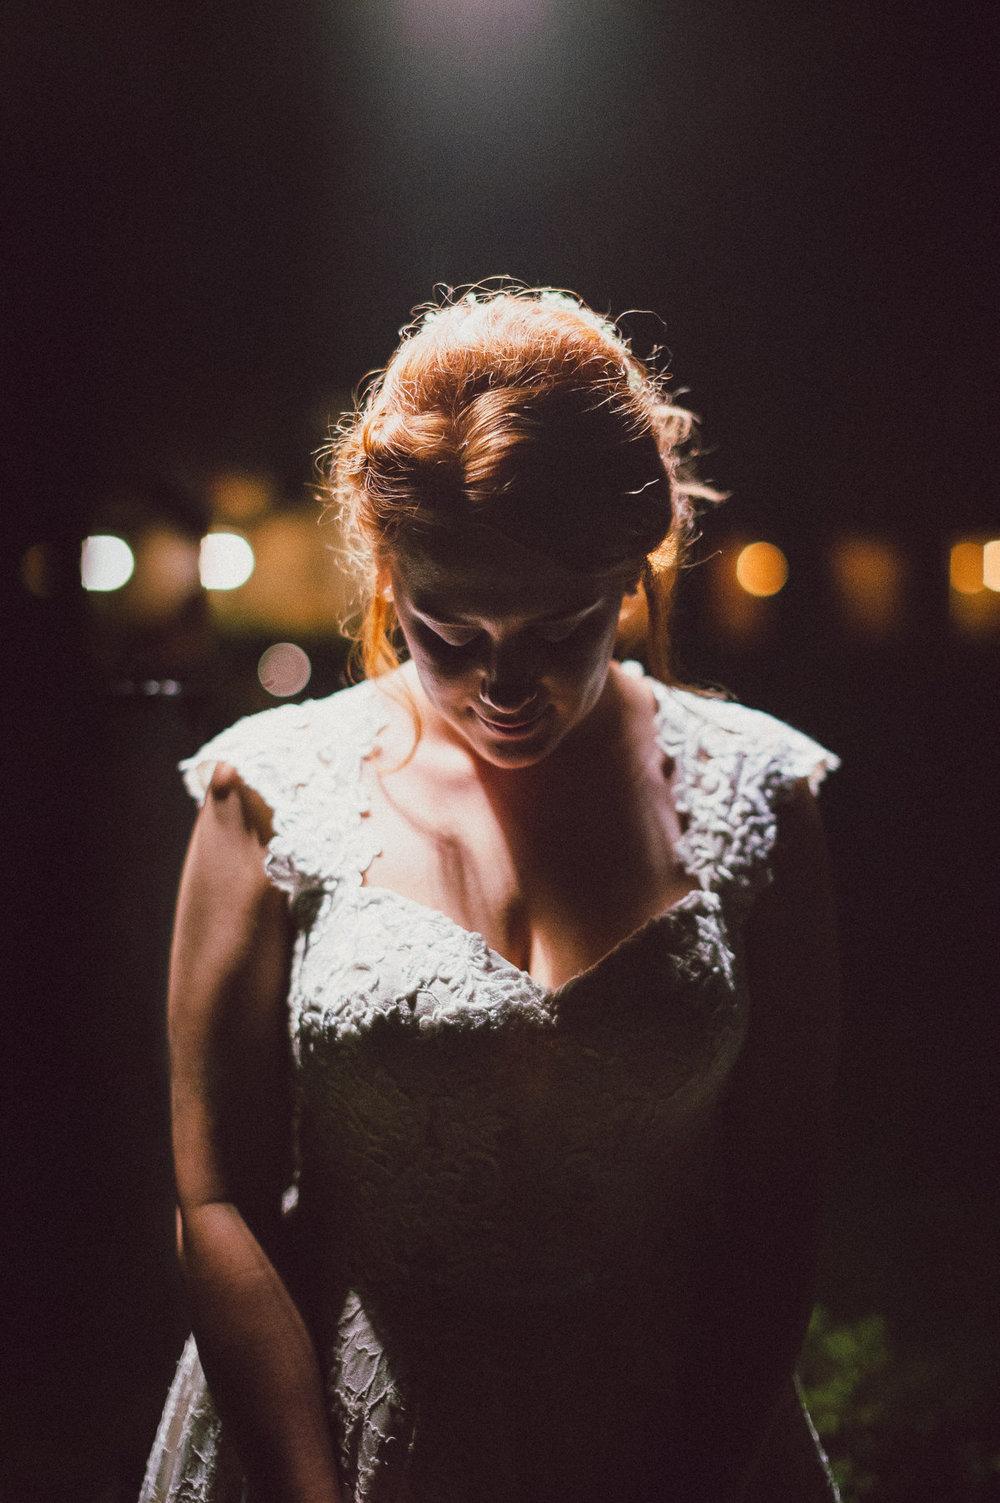 breighton-and-basette-photography-copyrighted-image-blog-amanda-and-eric-wedding-134.jpg